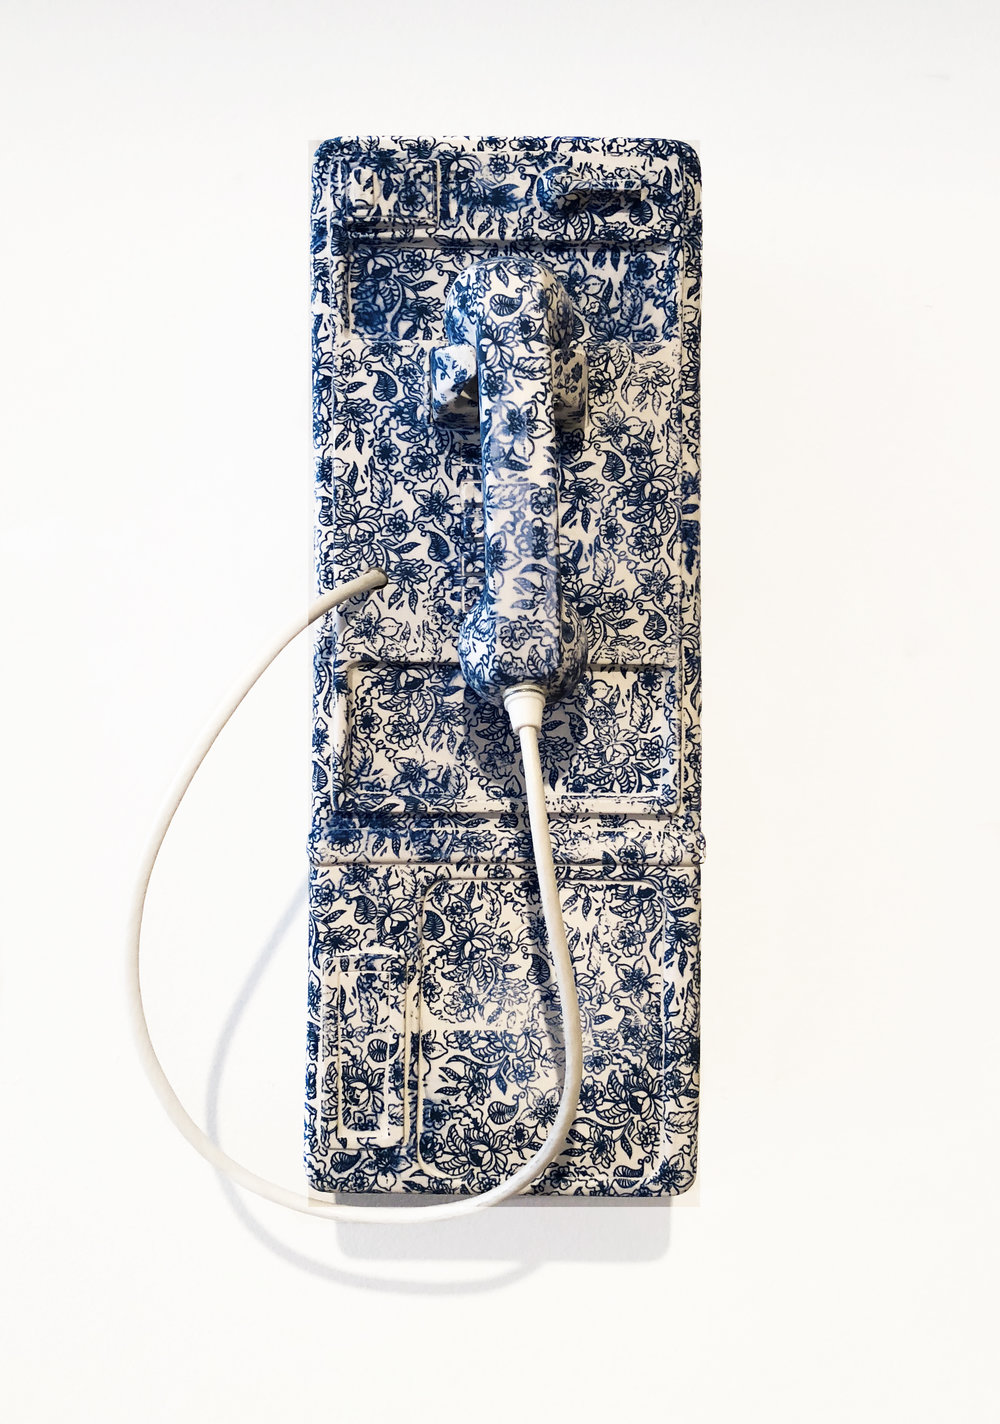 Brock DeBoer  1-800-BLU-WITE,  2018 porcelain, cobalt oxide, pendant cord 19 x 10 x 9 in.